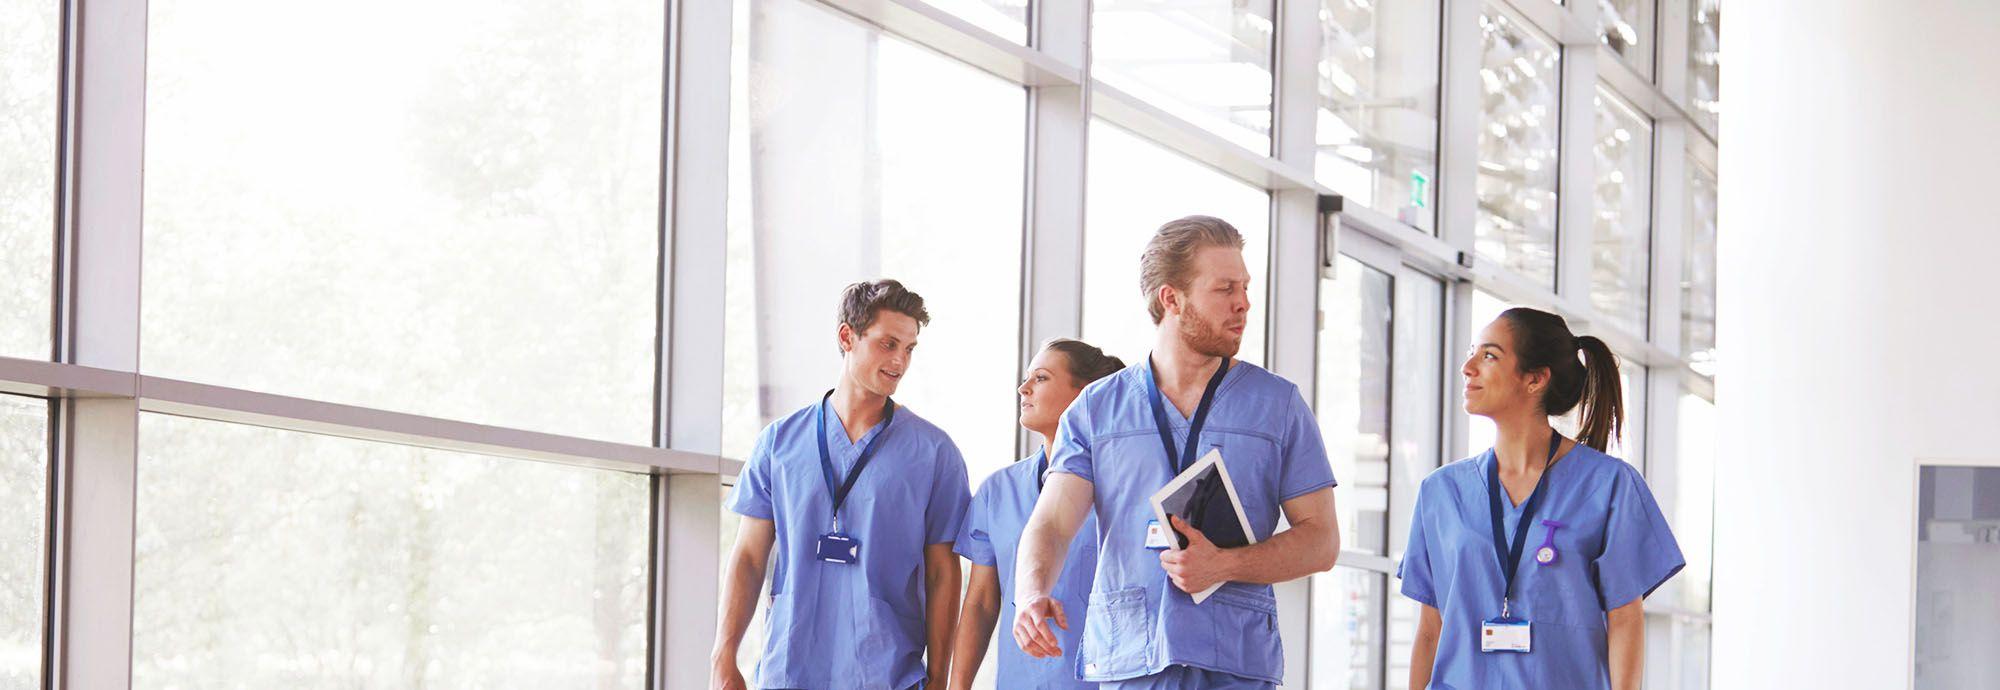 coperture assicurative cliniche laboratori